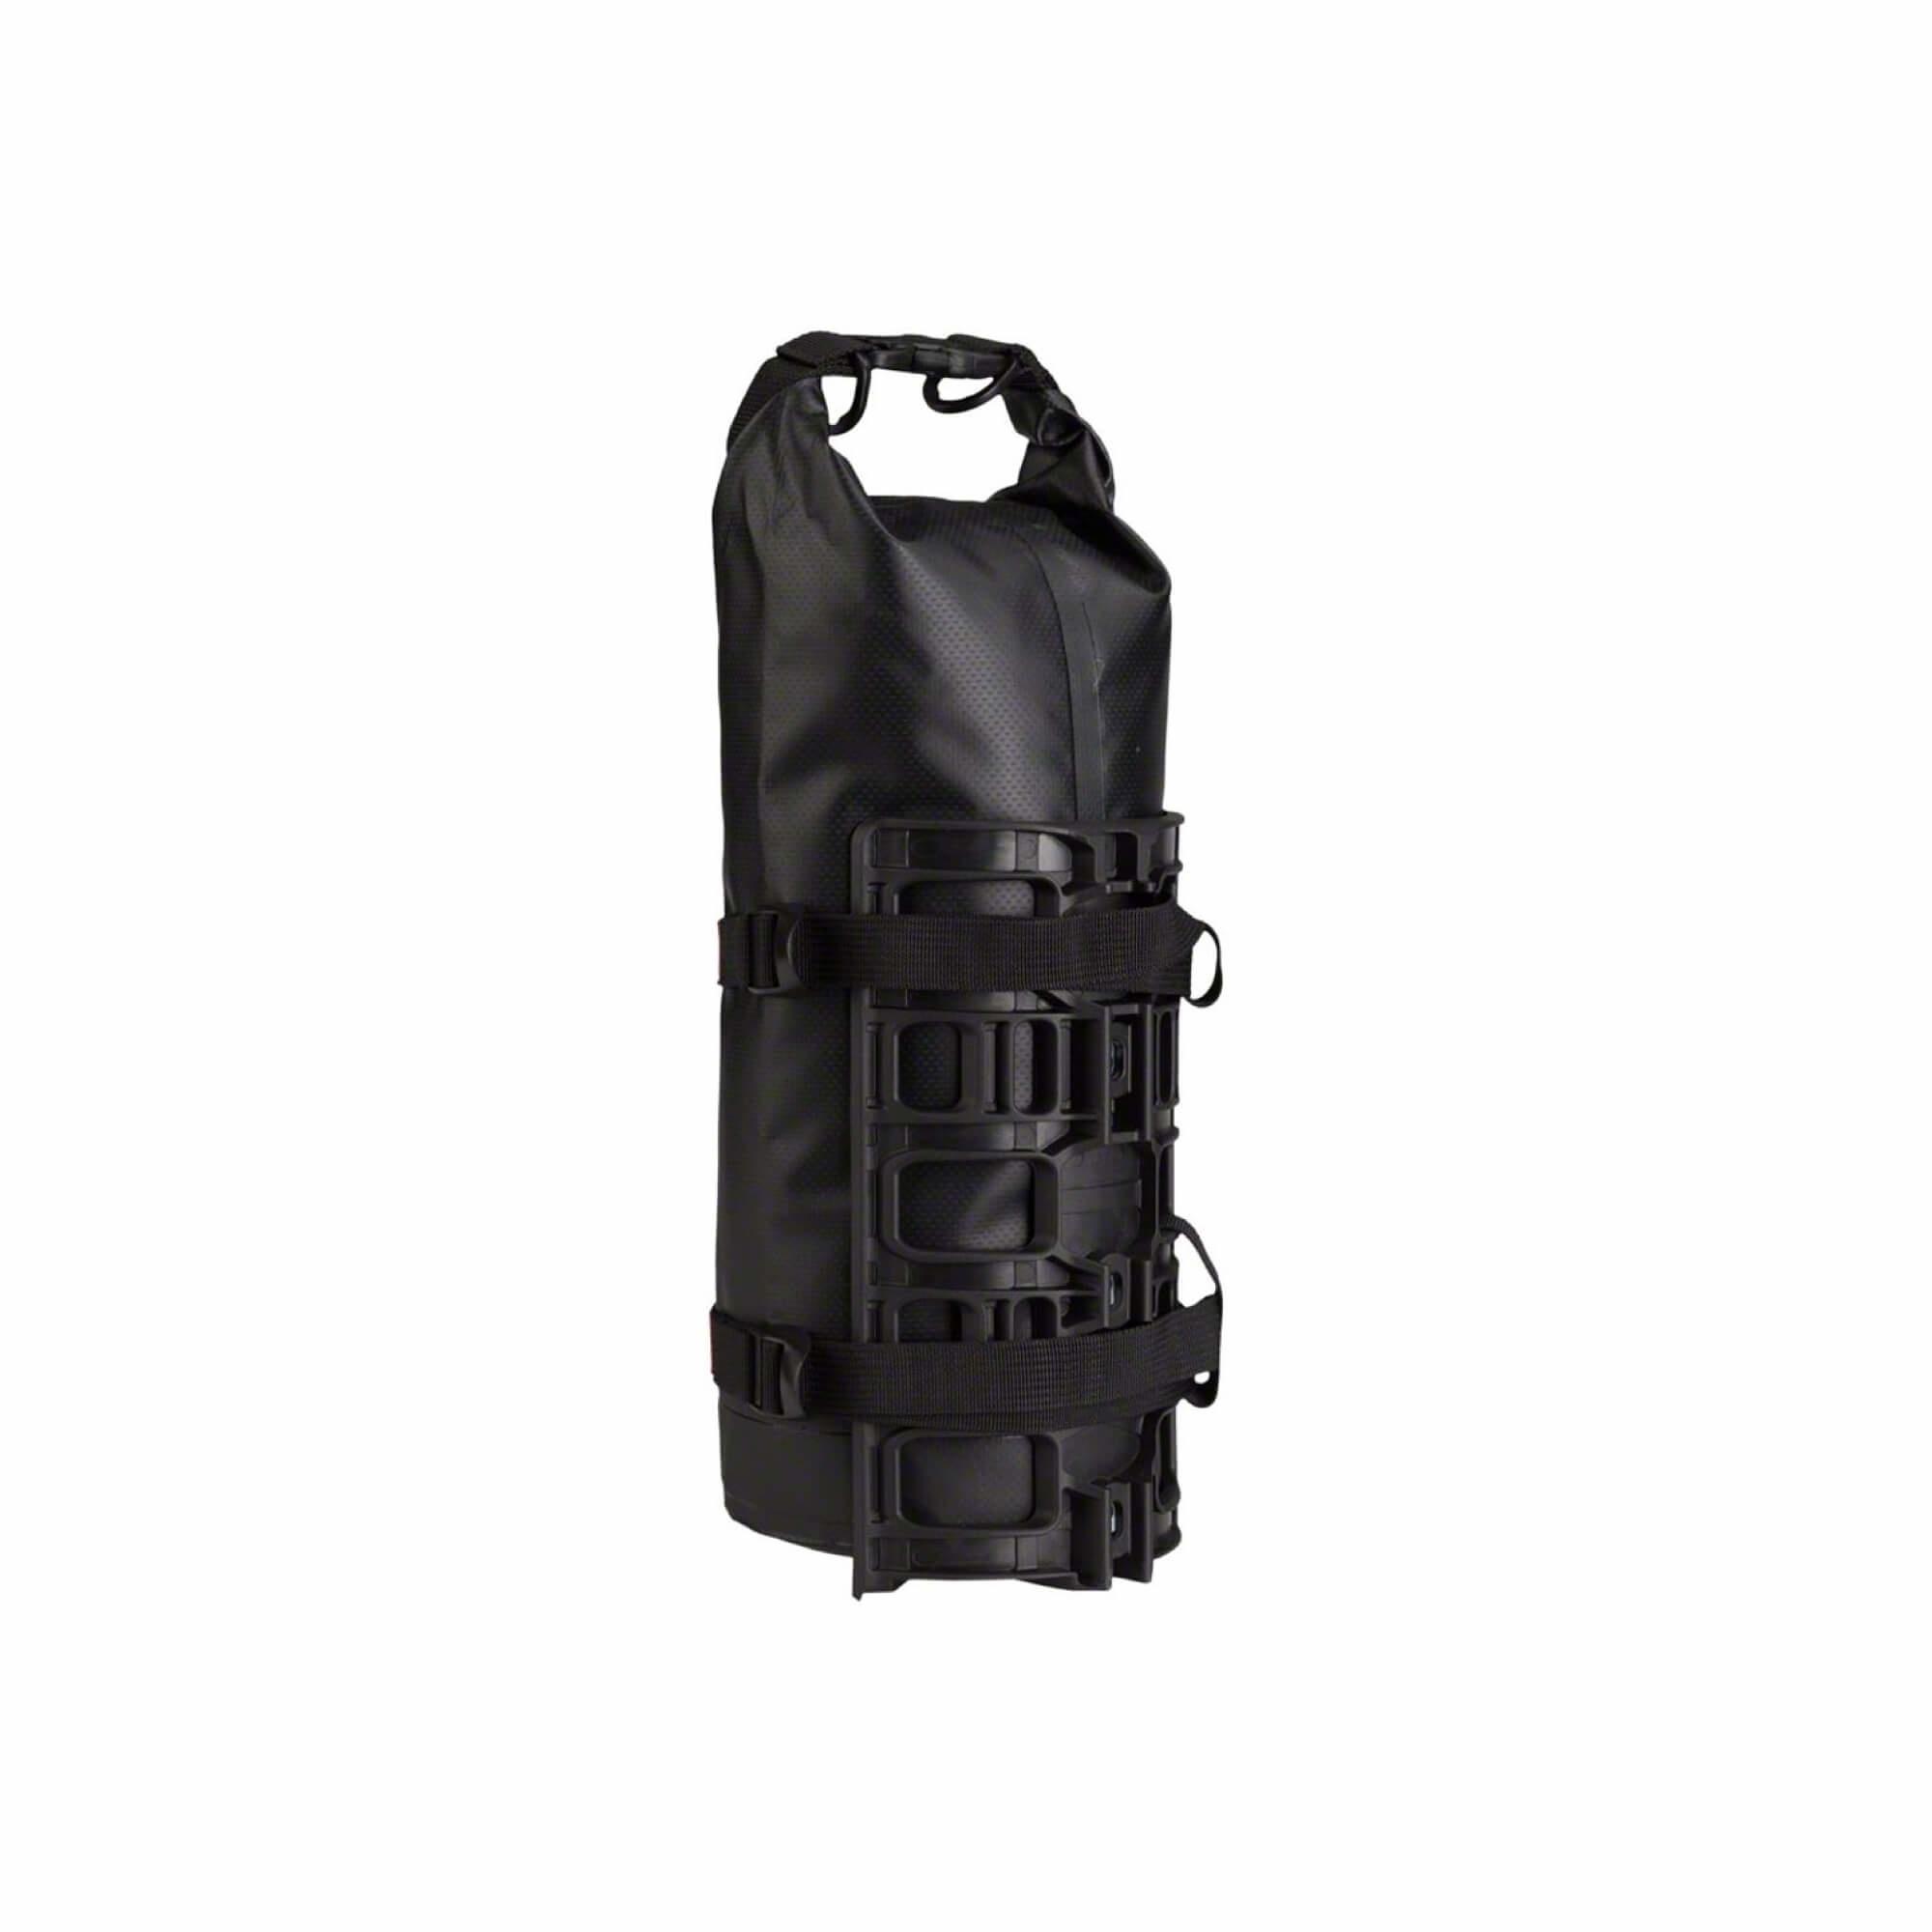 Anything Cage Bag Black Colour: Black-3